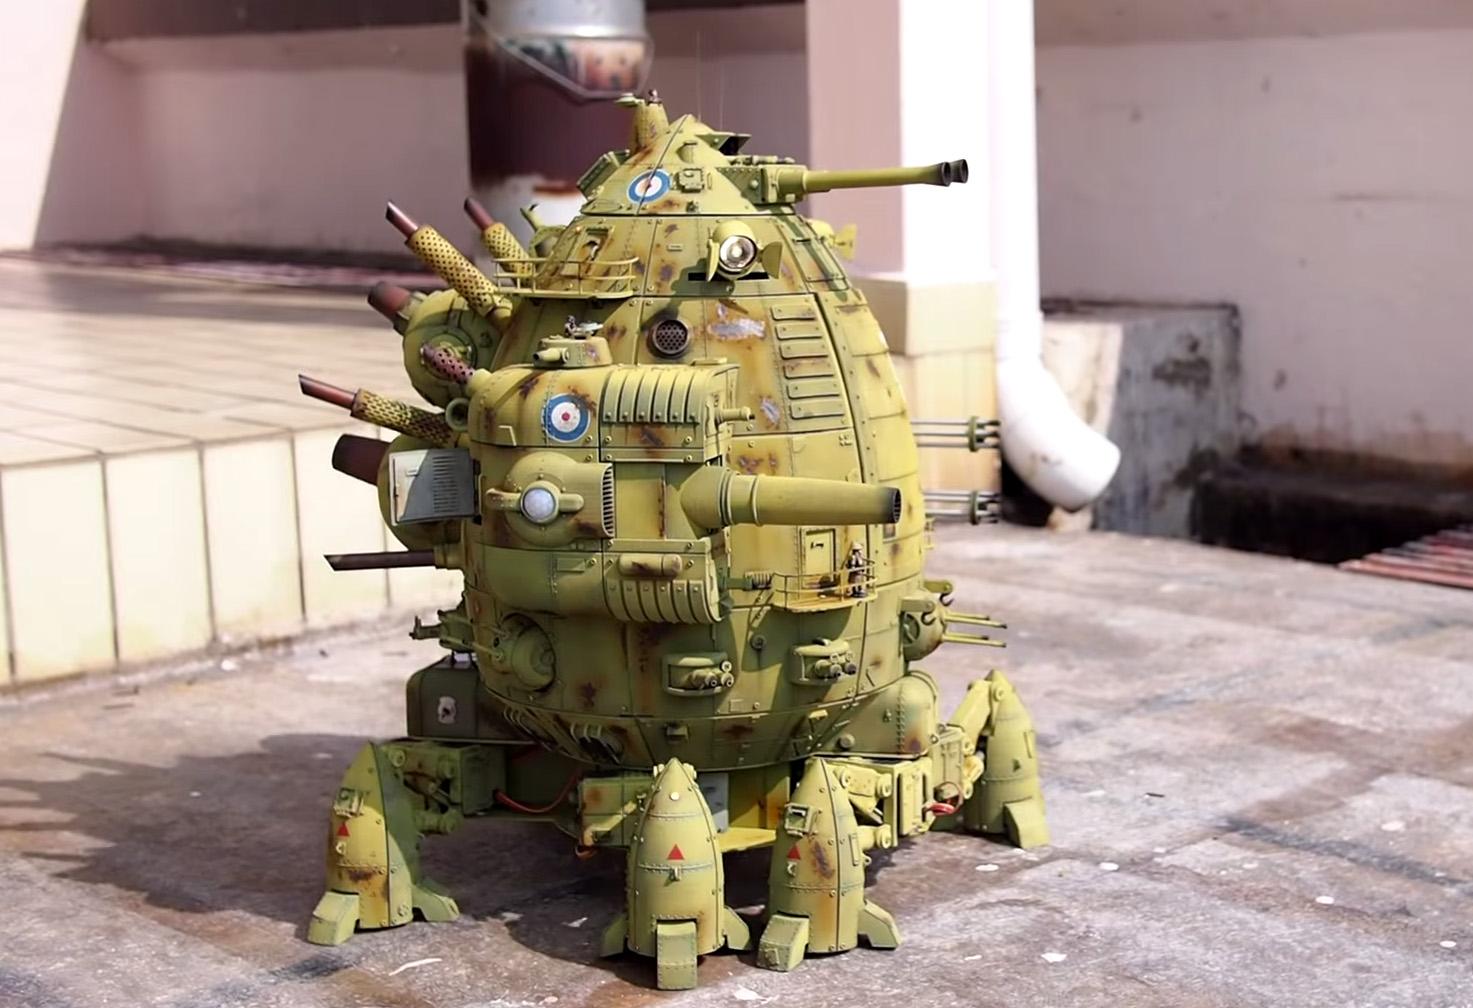 HMC Boudicca of the Codename Colossus toyline